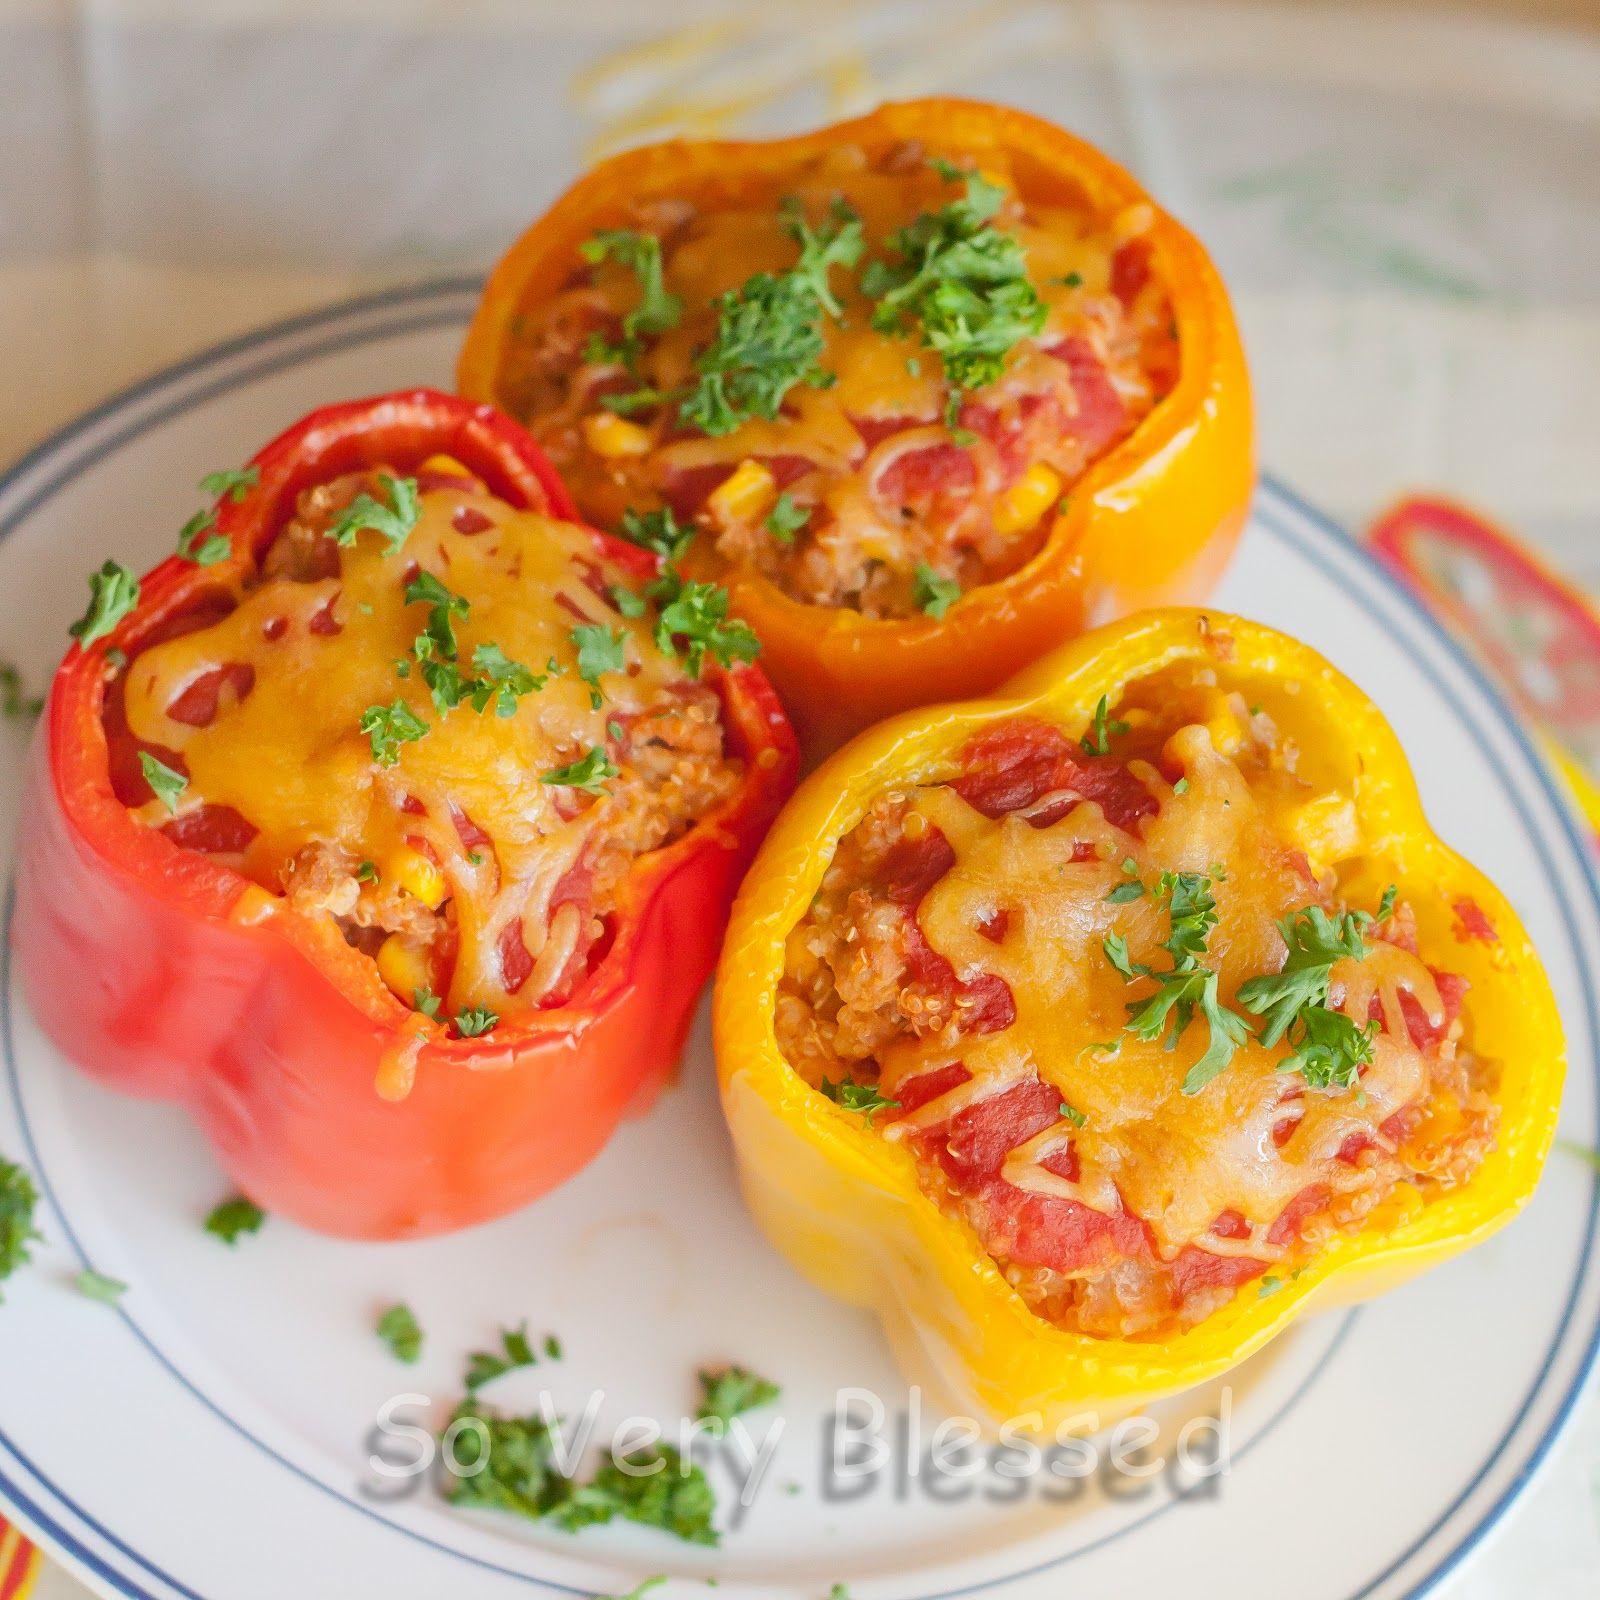 Quinoa & Turkey Stuffed Peppers